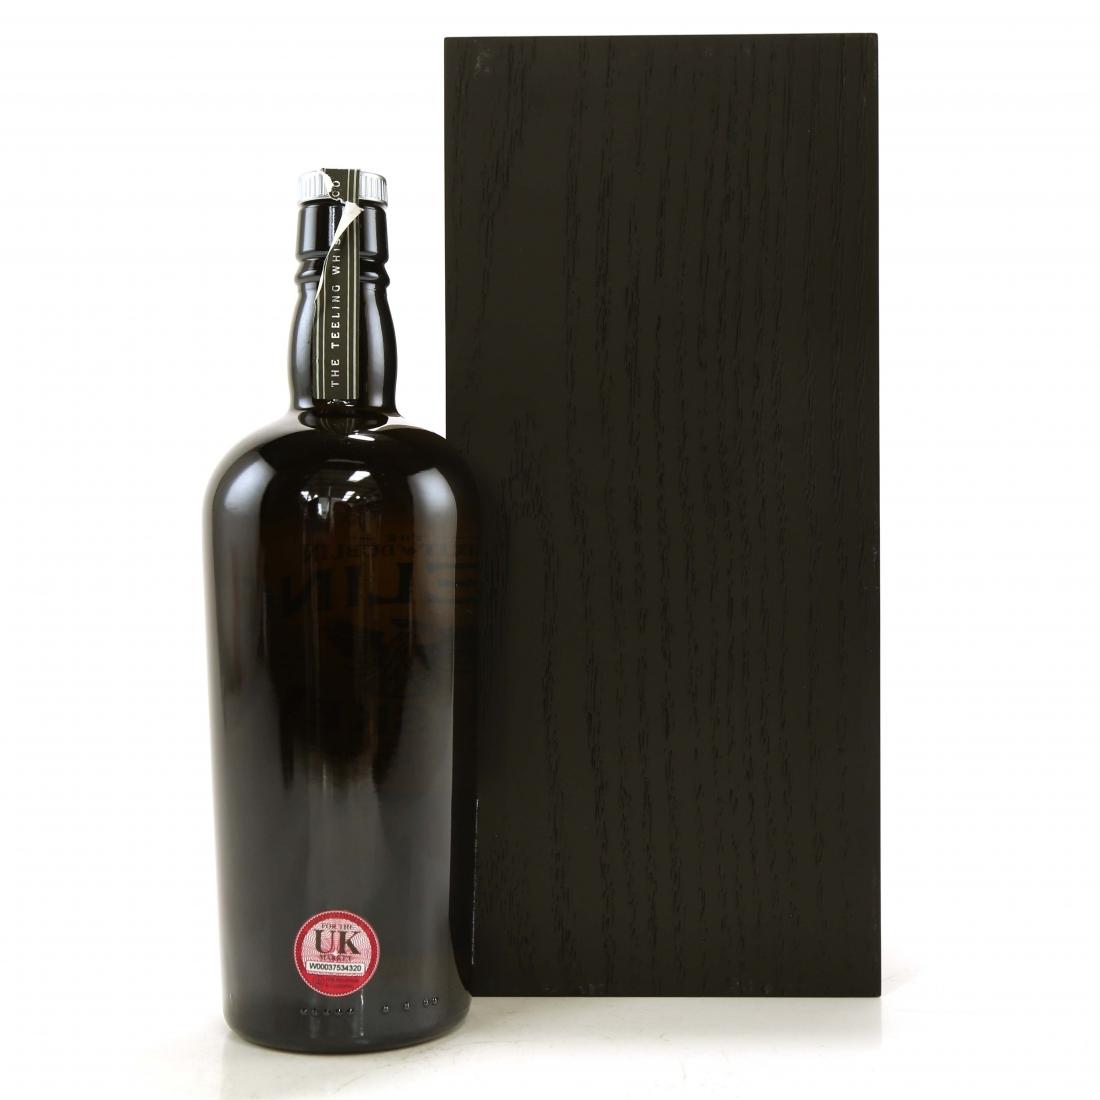 Teeling Celebratory Single Pot Still Whiskey / Bottle #092